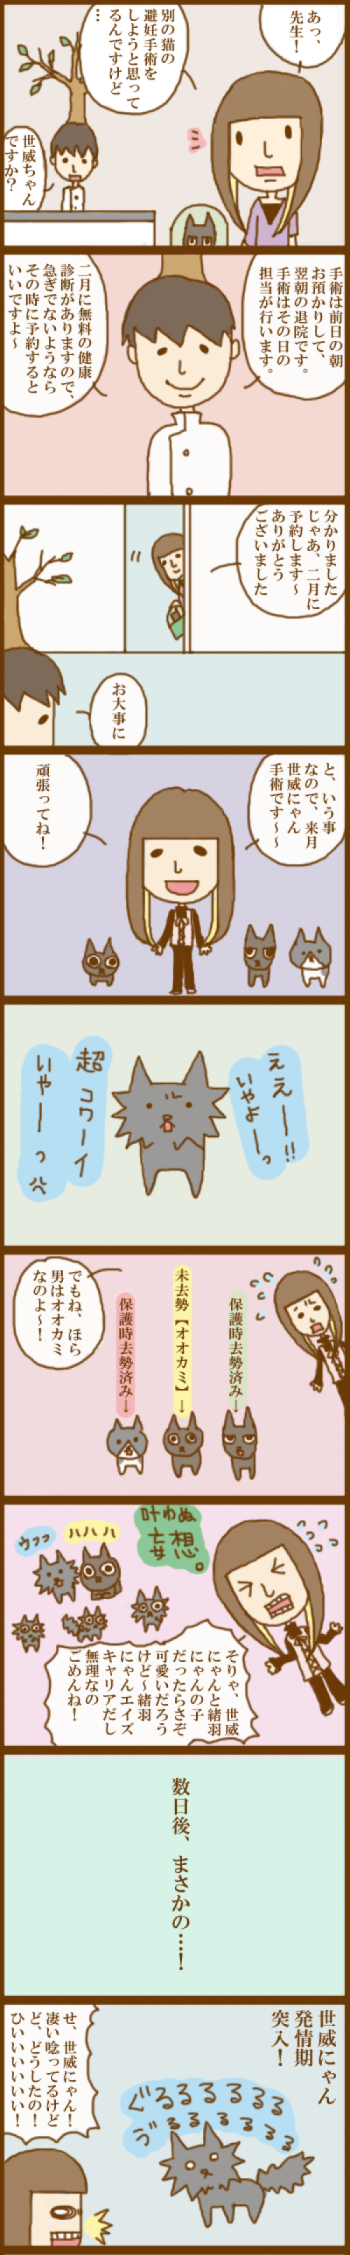 f:id:suzuokayu:20201114180902j:plain